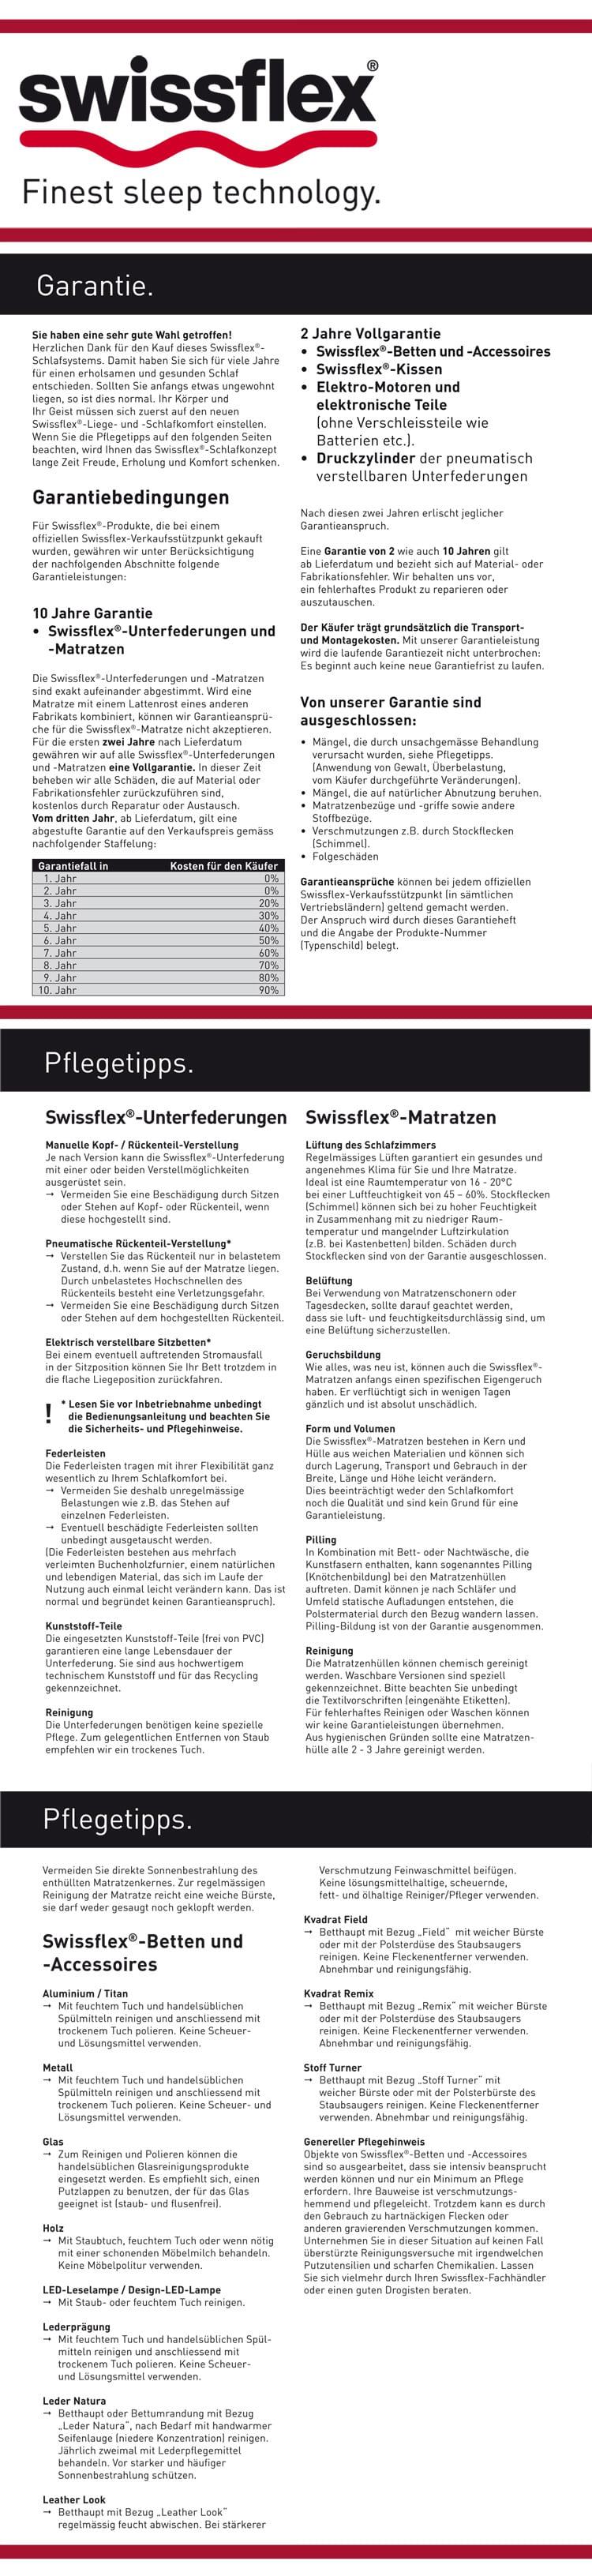 Swissflex Garantie